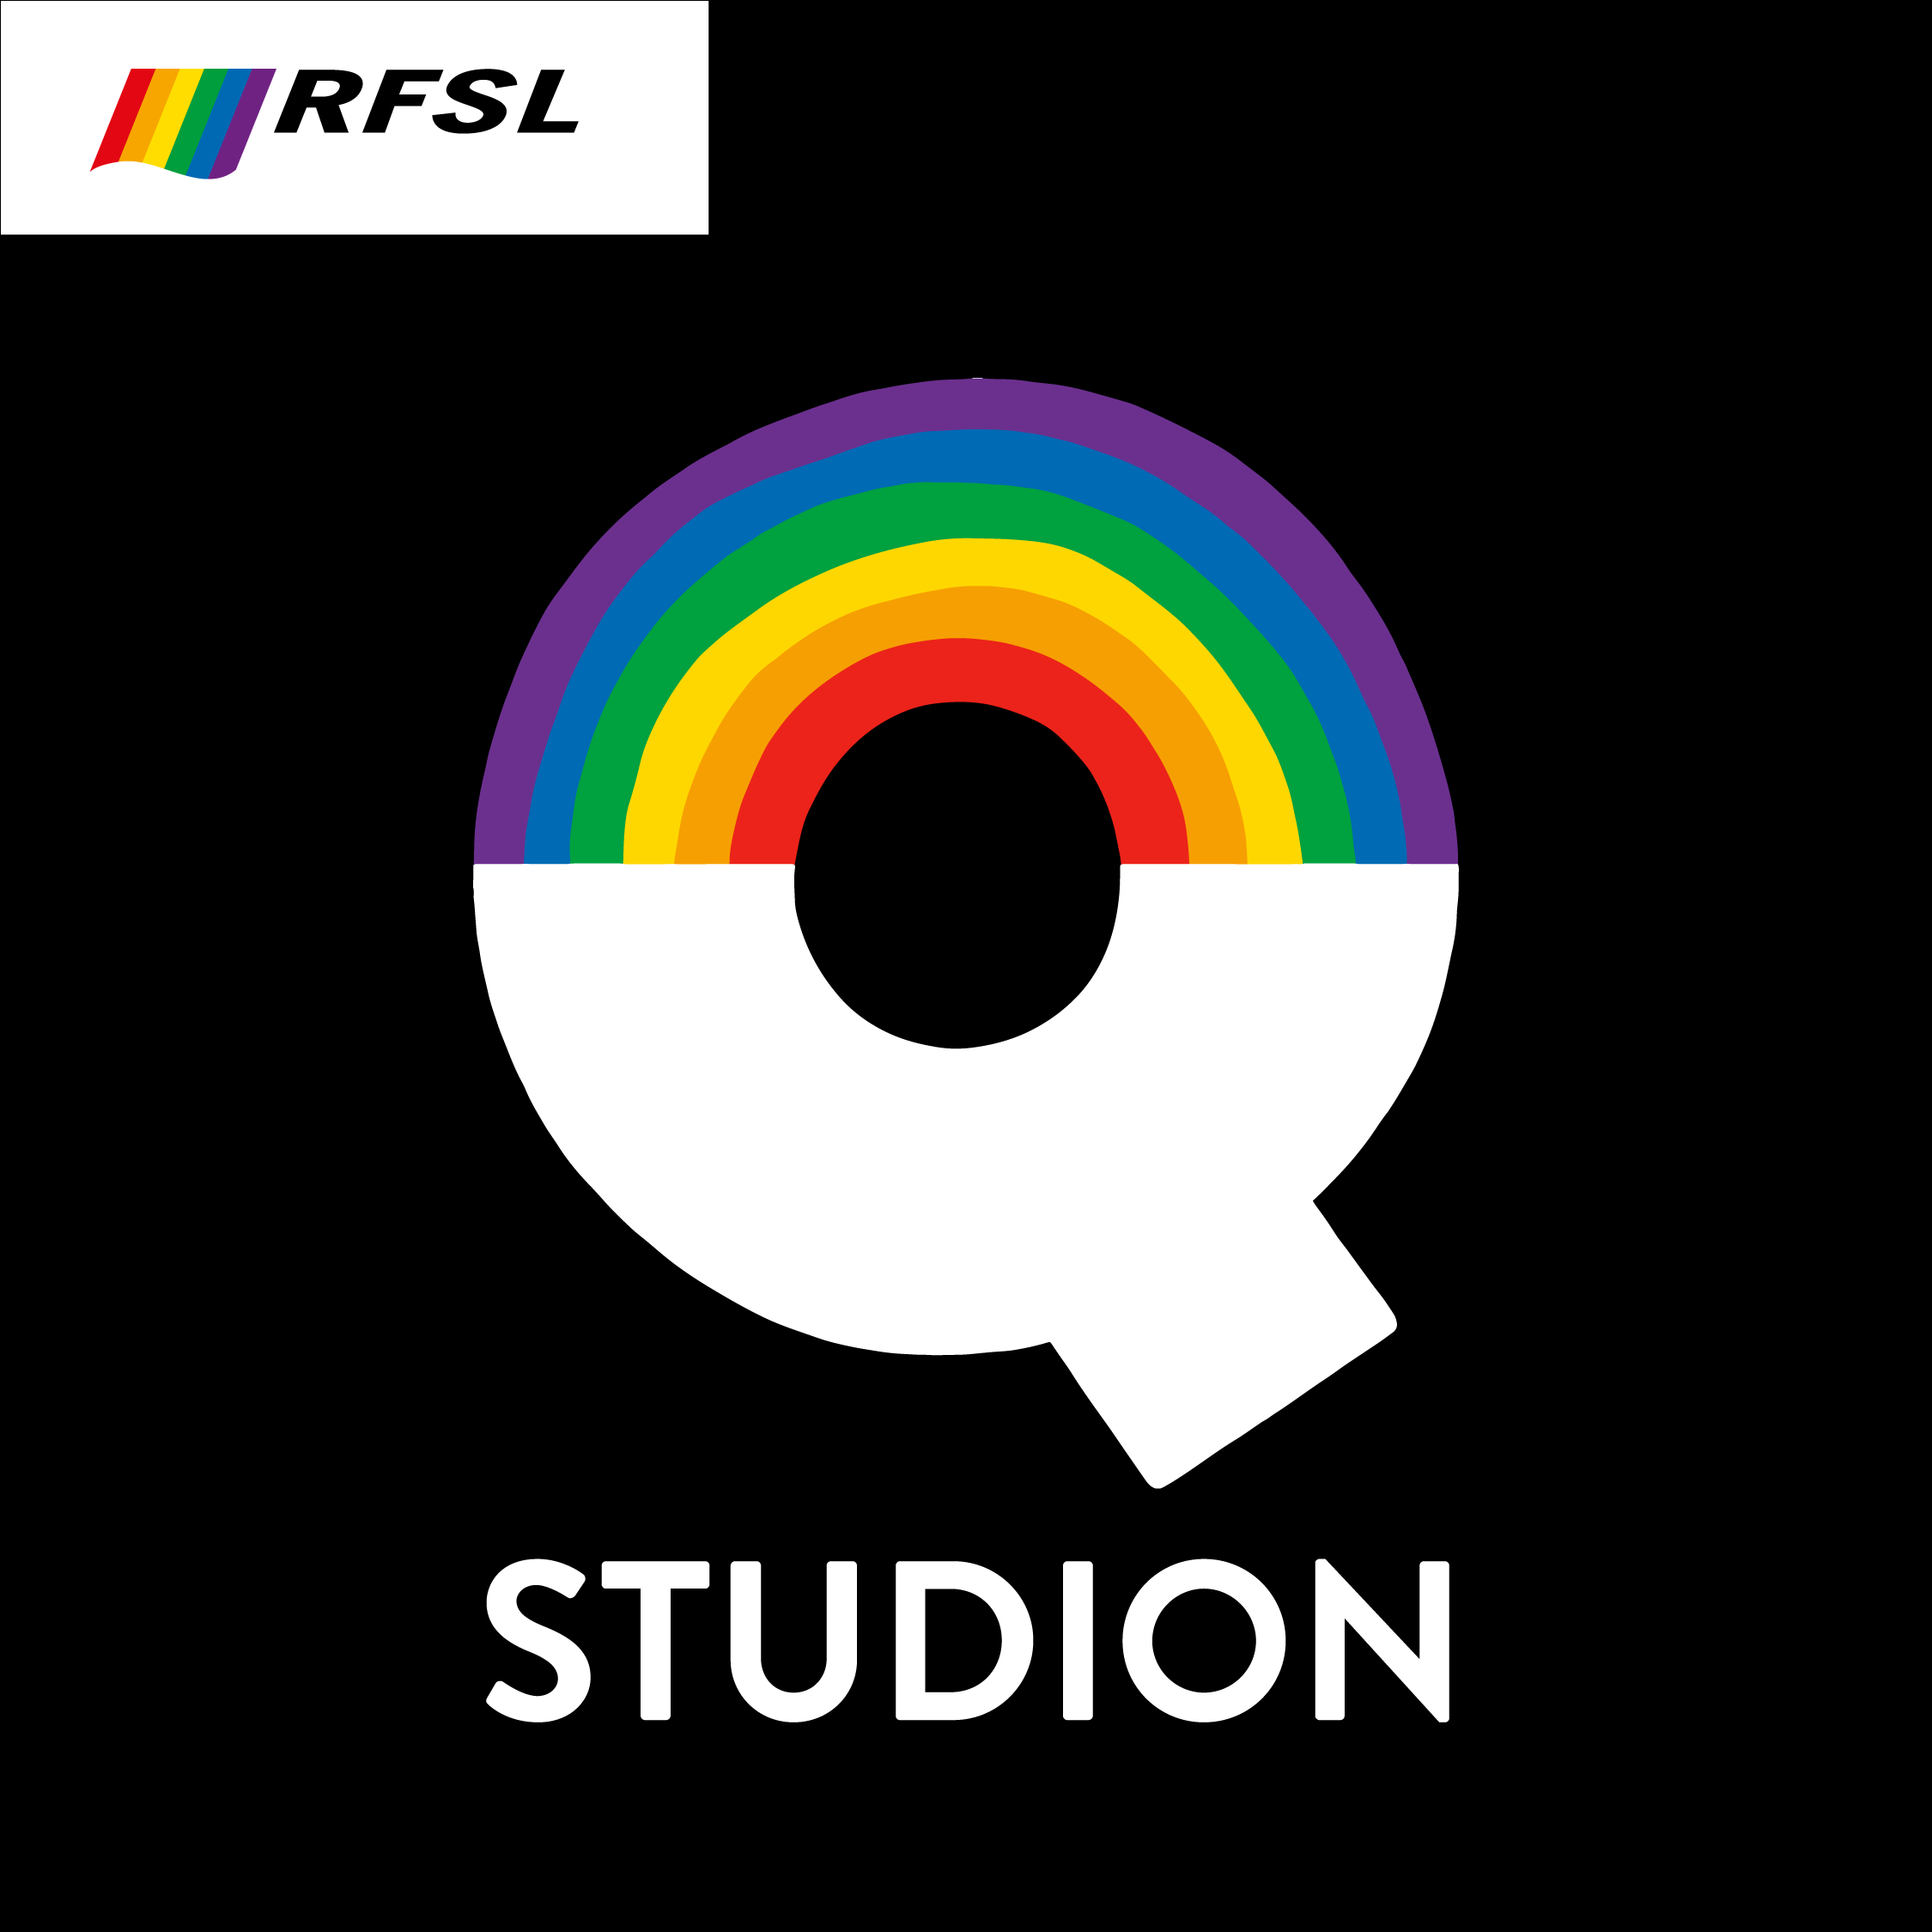 Q-Studion 6. Komma ut som queer, same eller muslim?